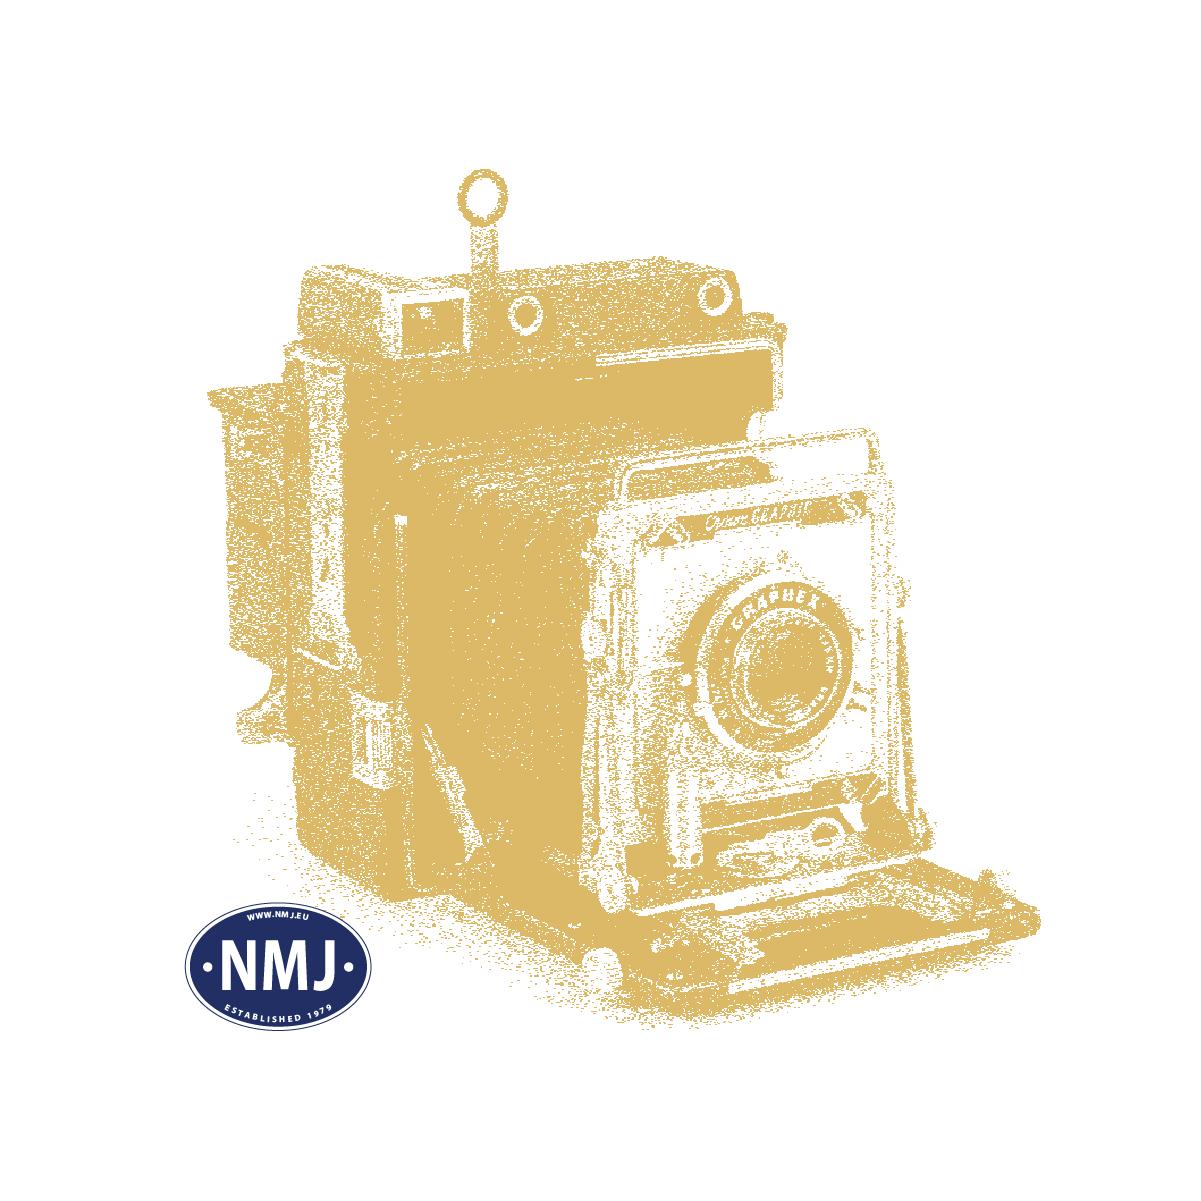 NMJT80.103 - NMJ Topline NSB EL17.2223, DC, rotbraun